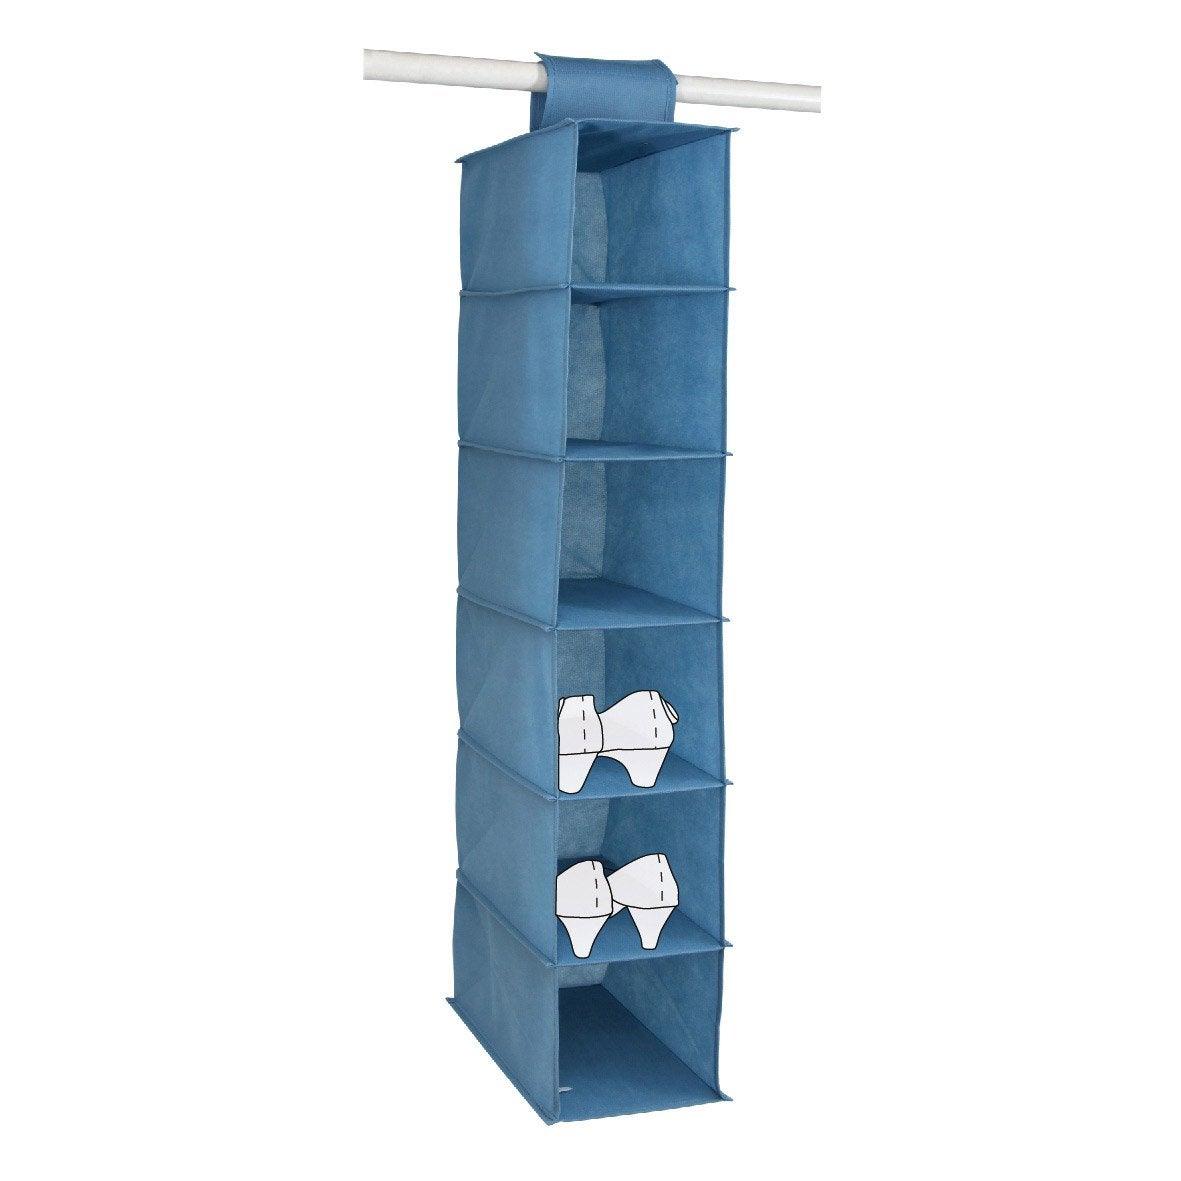 etag re suspendre 6 cases intiss bleu x x p. Black Bedroom Furniture Sets. Home Design Ideas